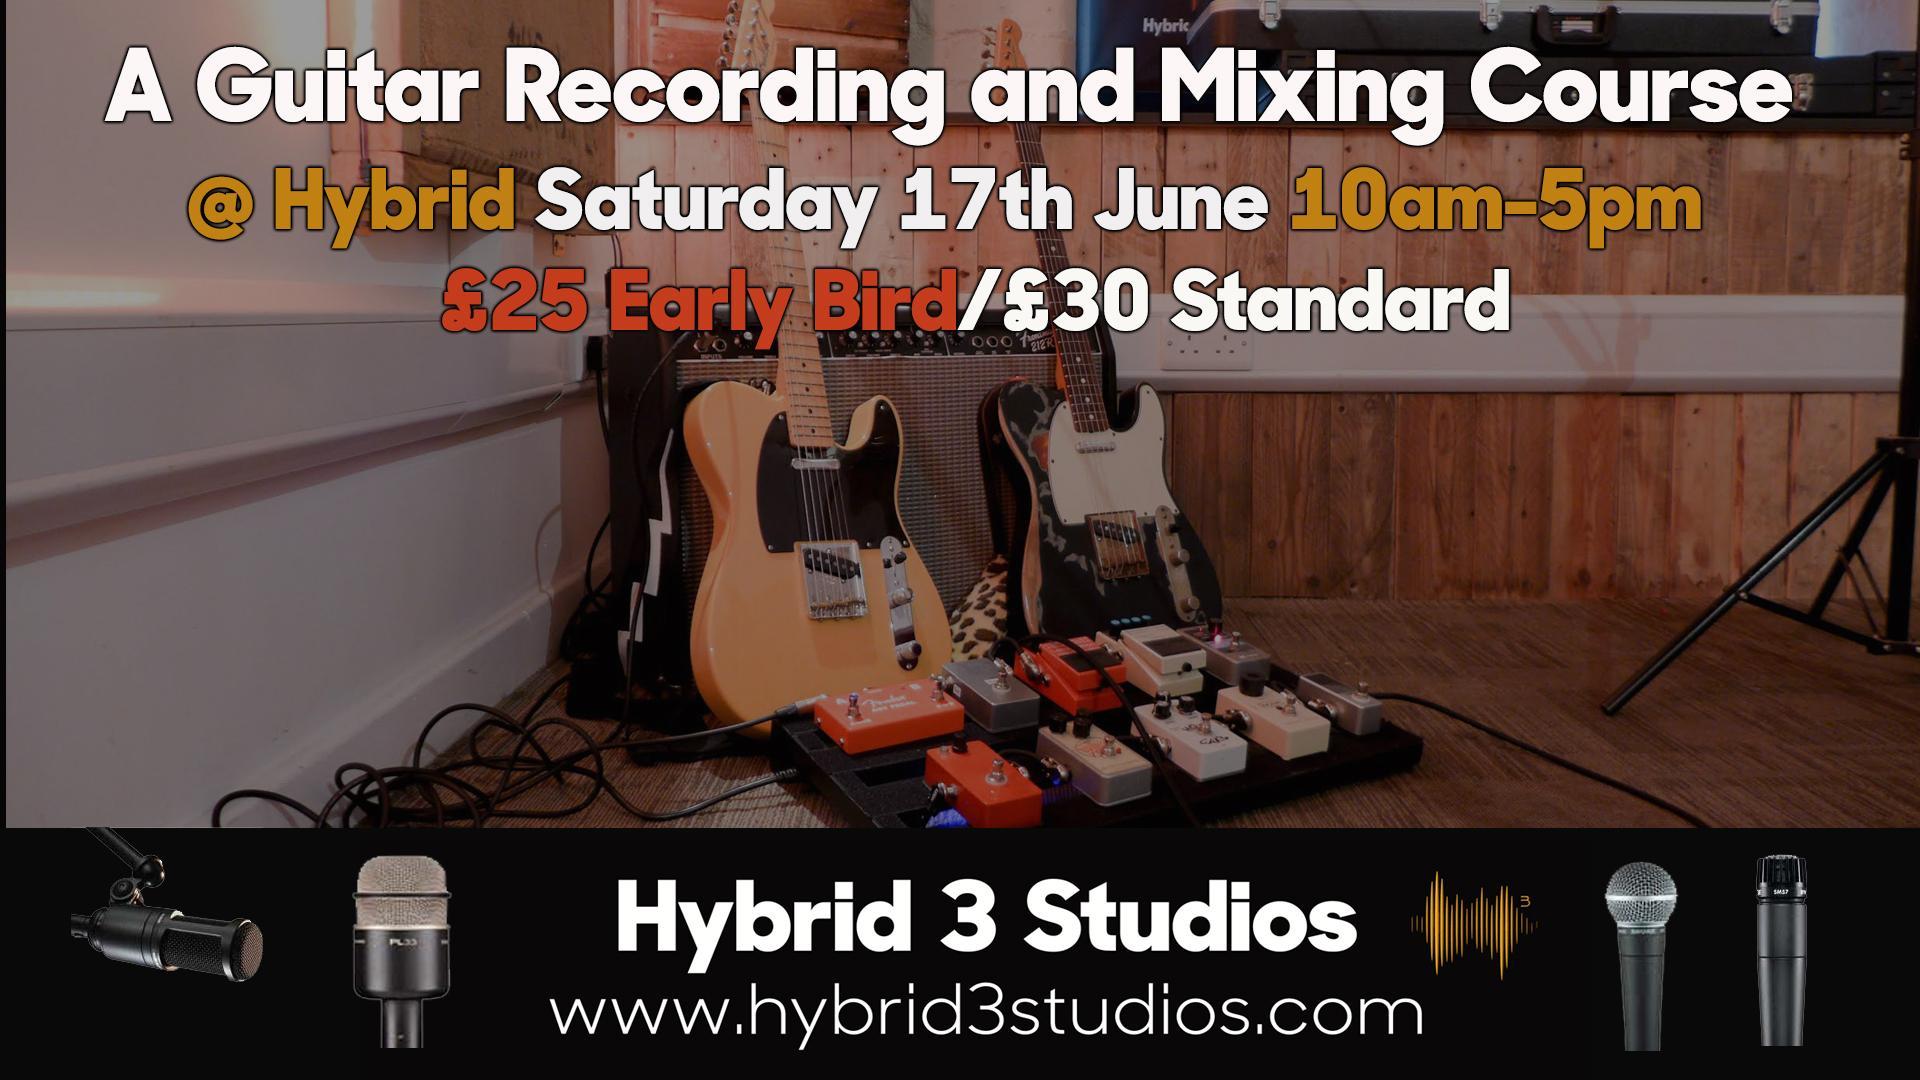 Guitar Recording and Mixing